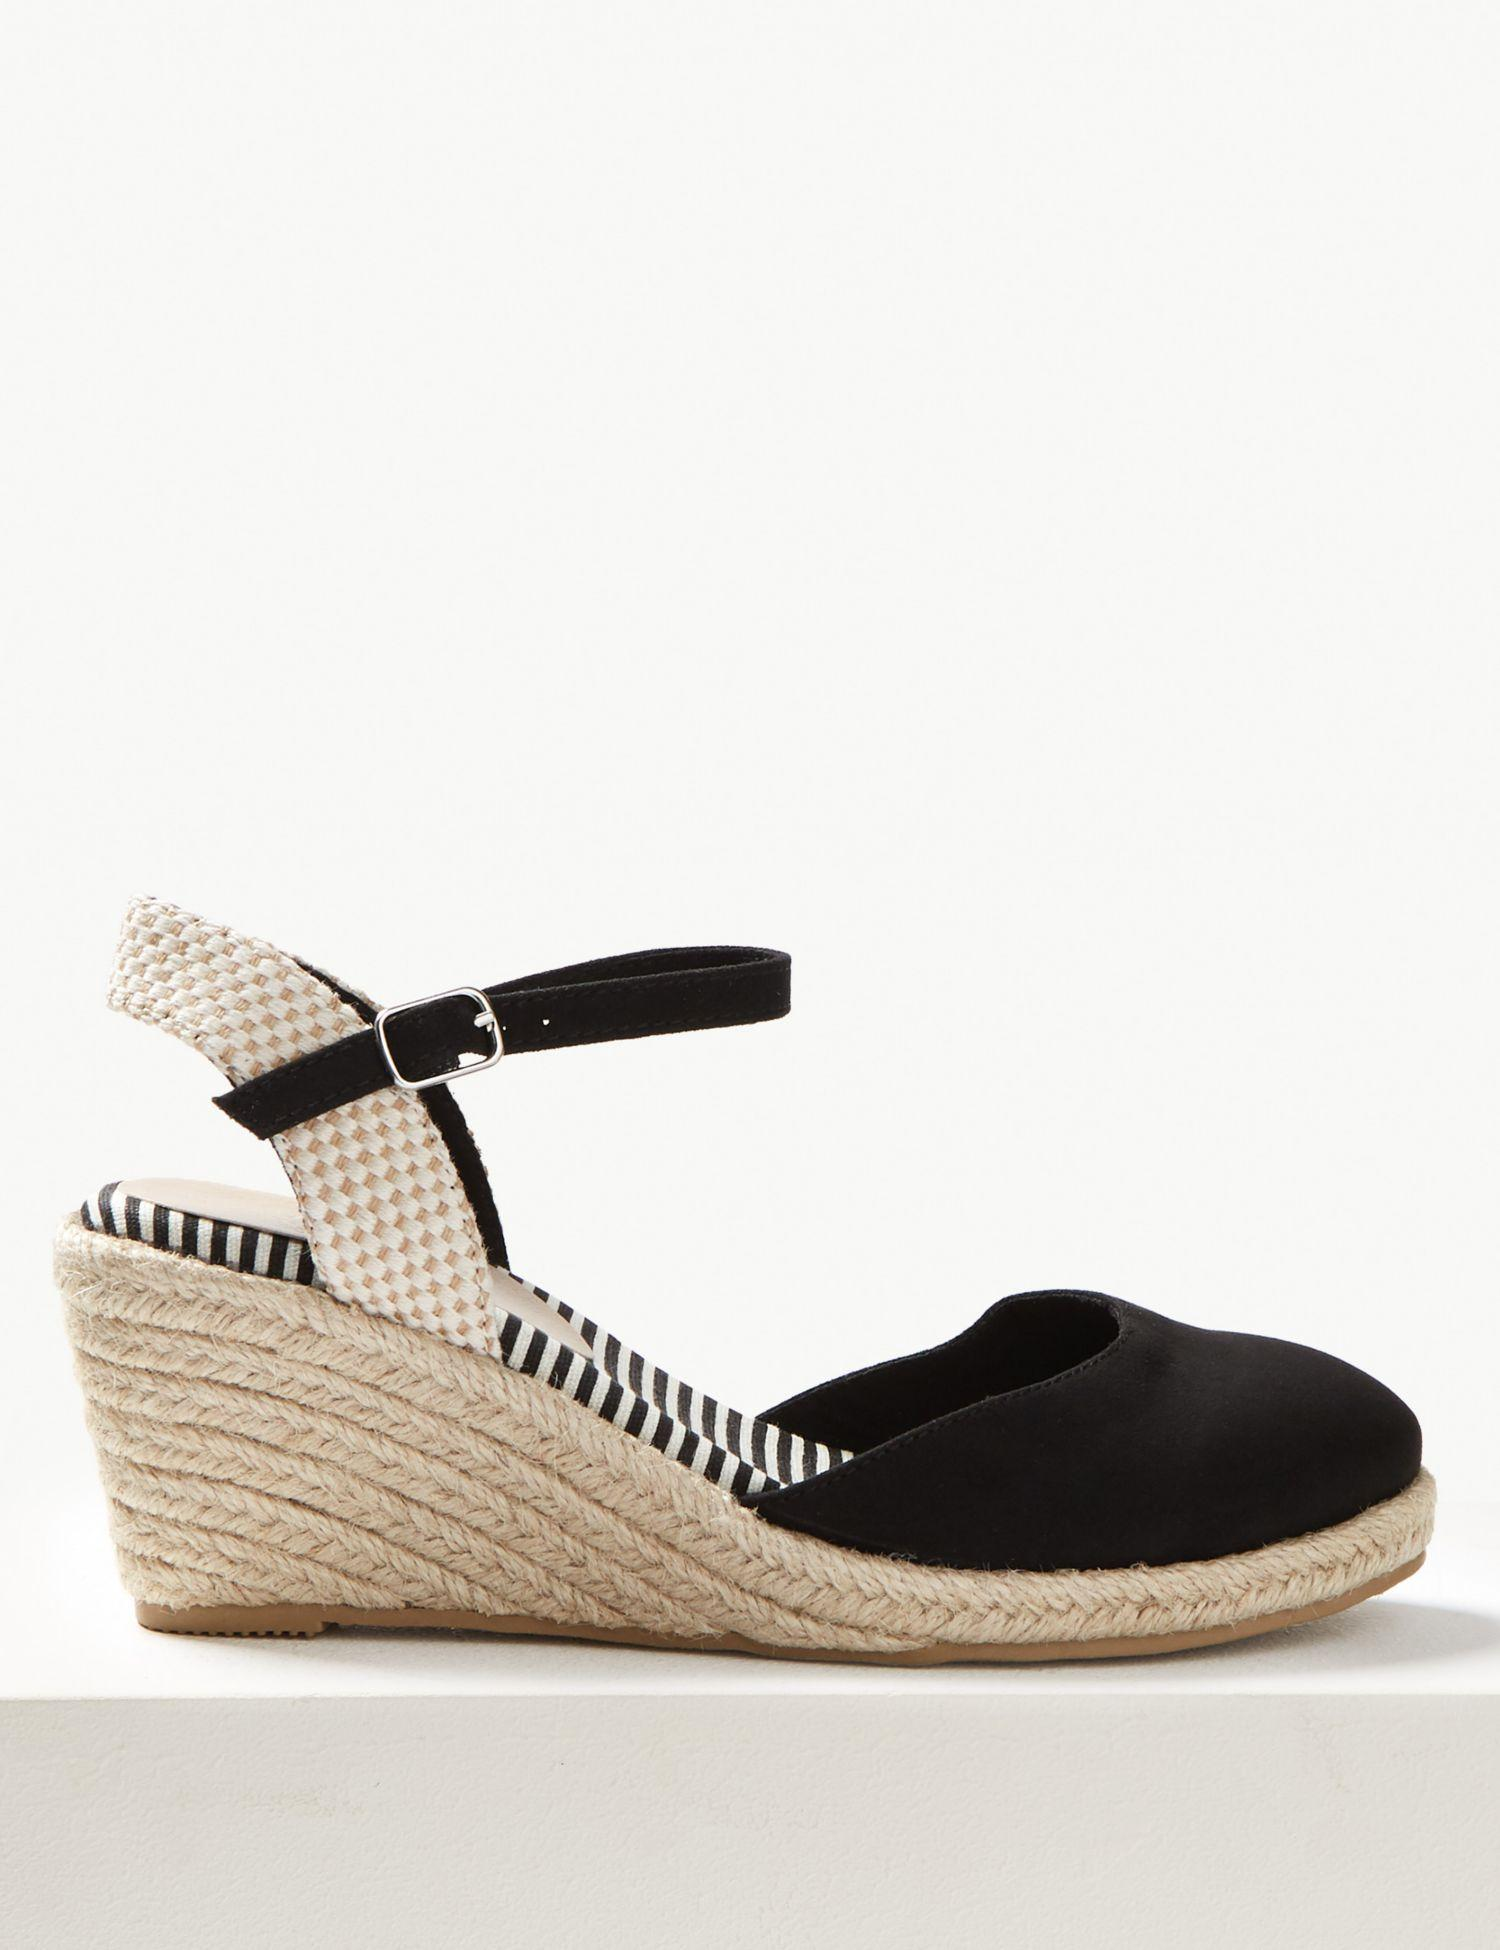 ce83eebd5ec Marks & Spencer Wedge Heel Almond Toe Espadrilles in Black - Lyst